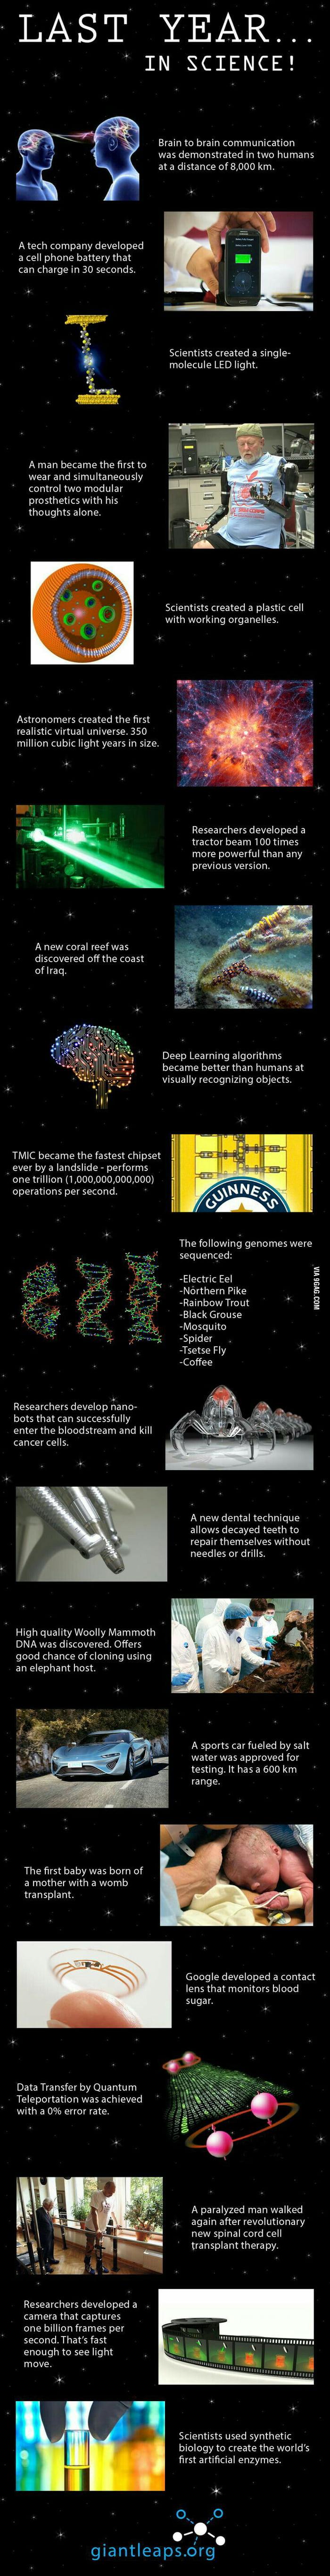 Last year scientific breakthroughs